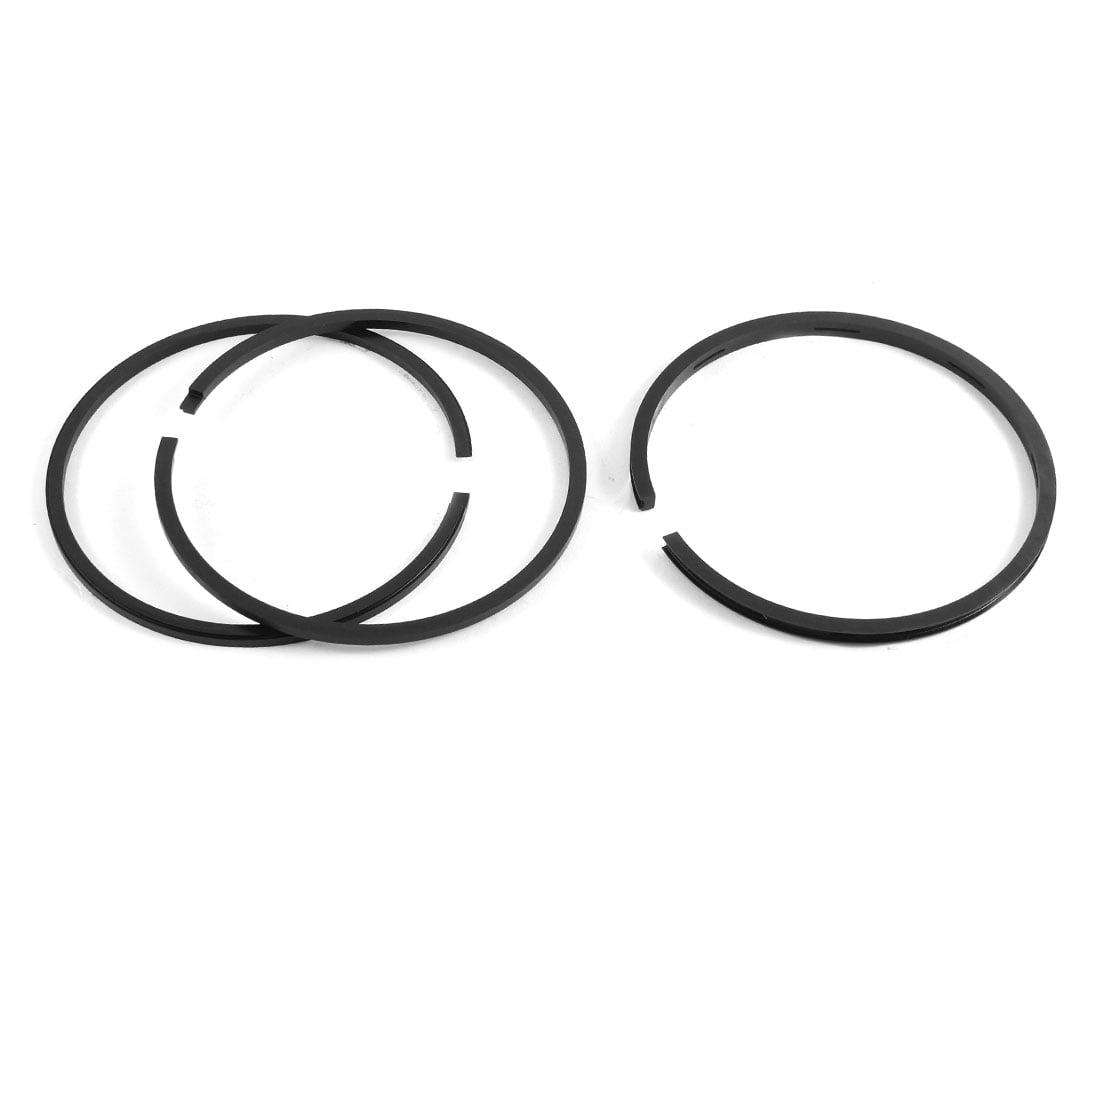 Air Compressor 90mm Dia Balance Sealing Piston Rings Set 3 Pcs